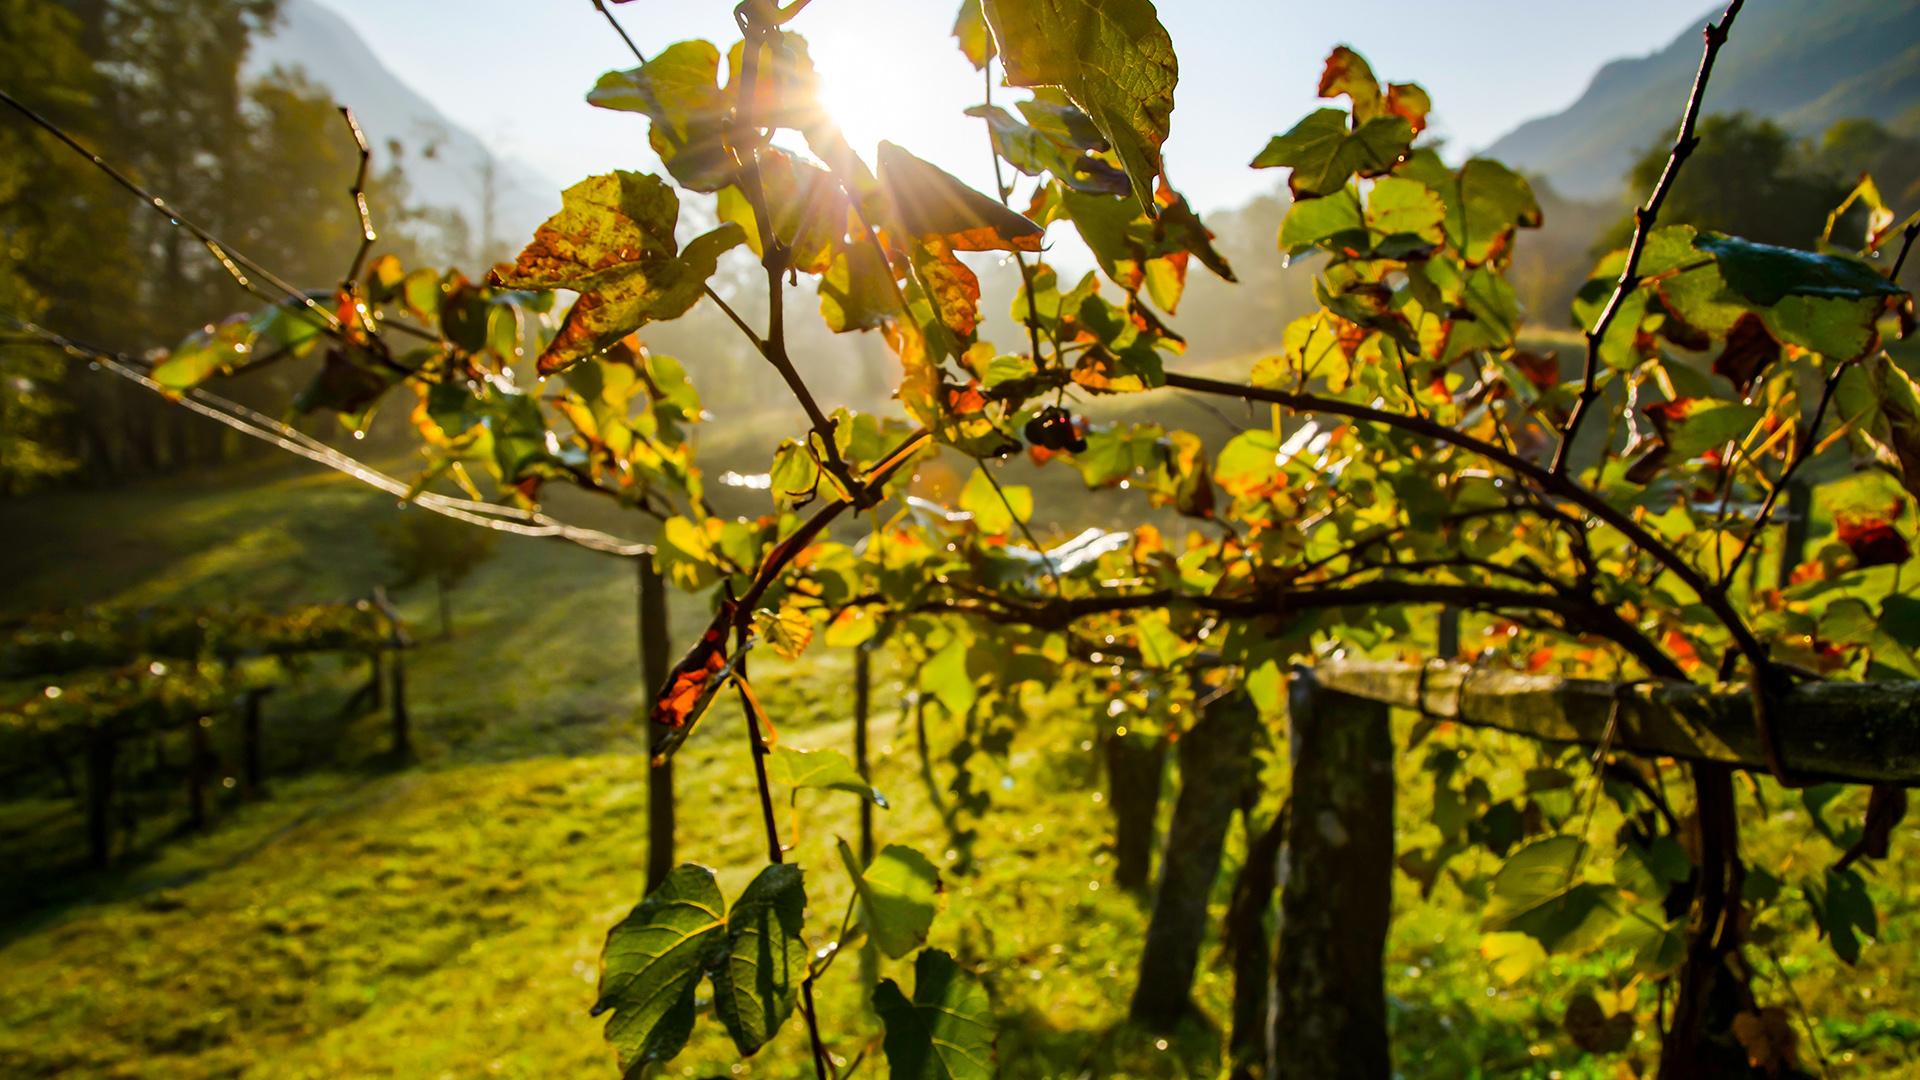 VM-_0005_beautiful-shot-wine-field-sunlight-switzerland